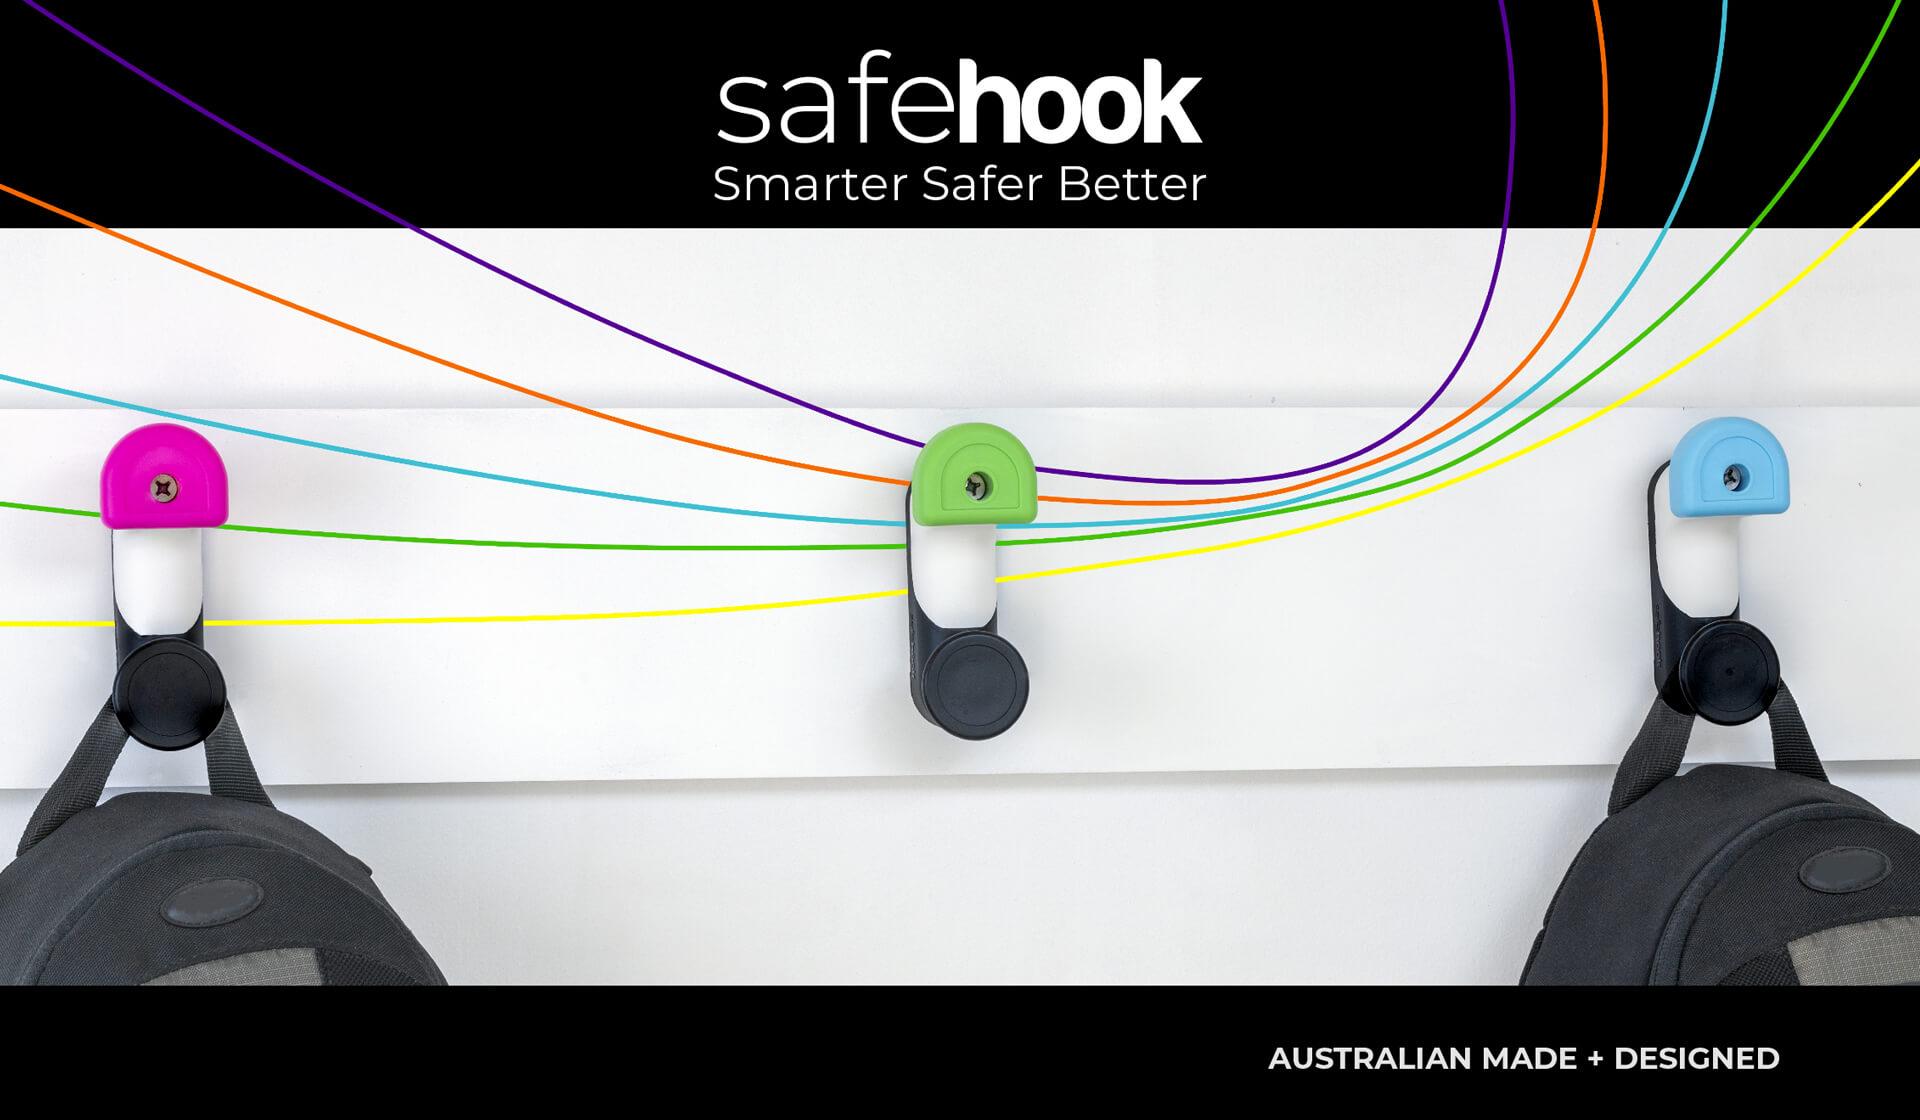 Safehook